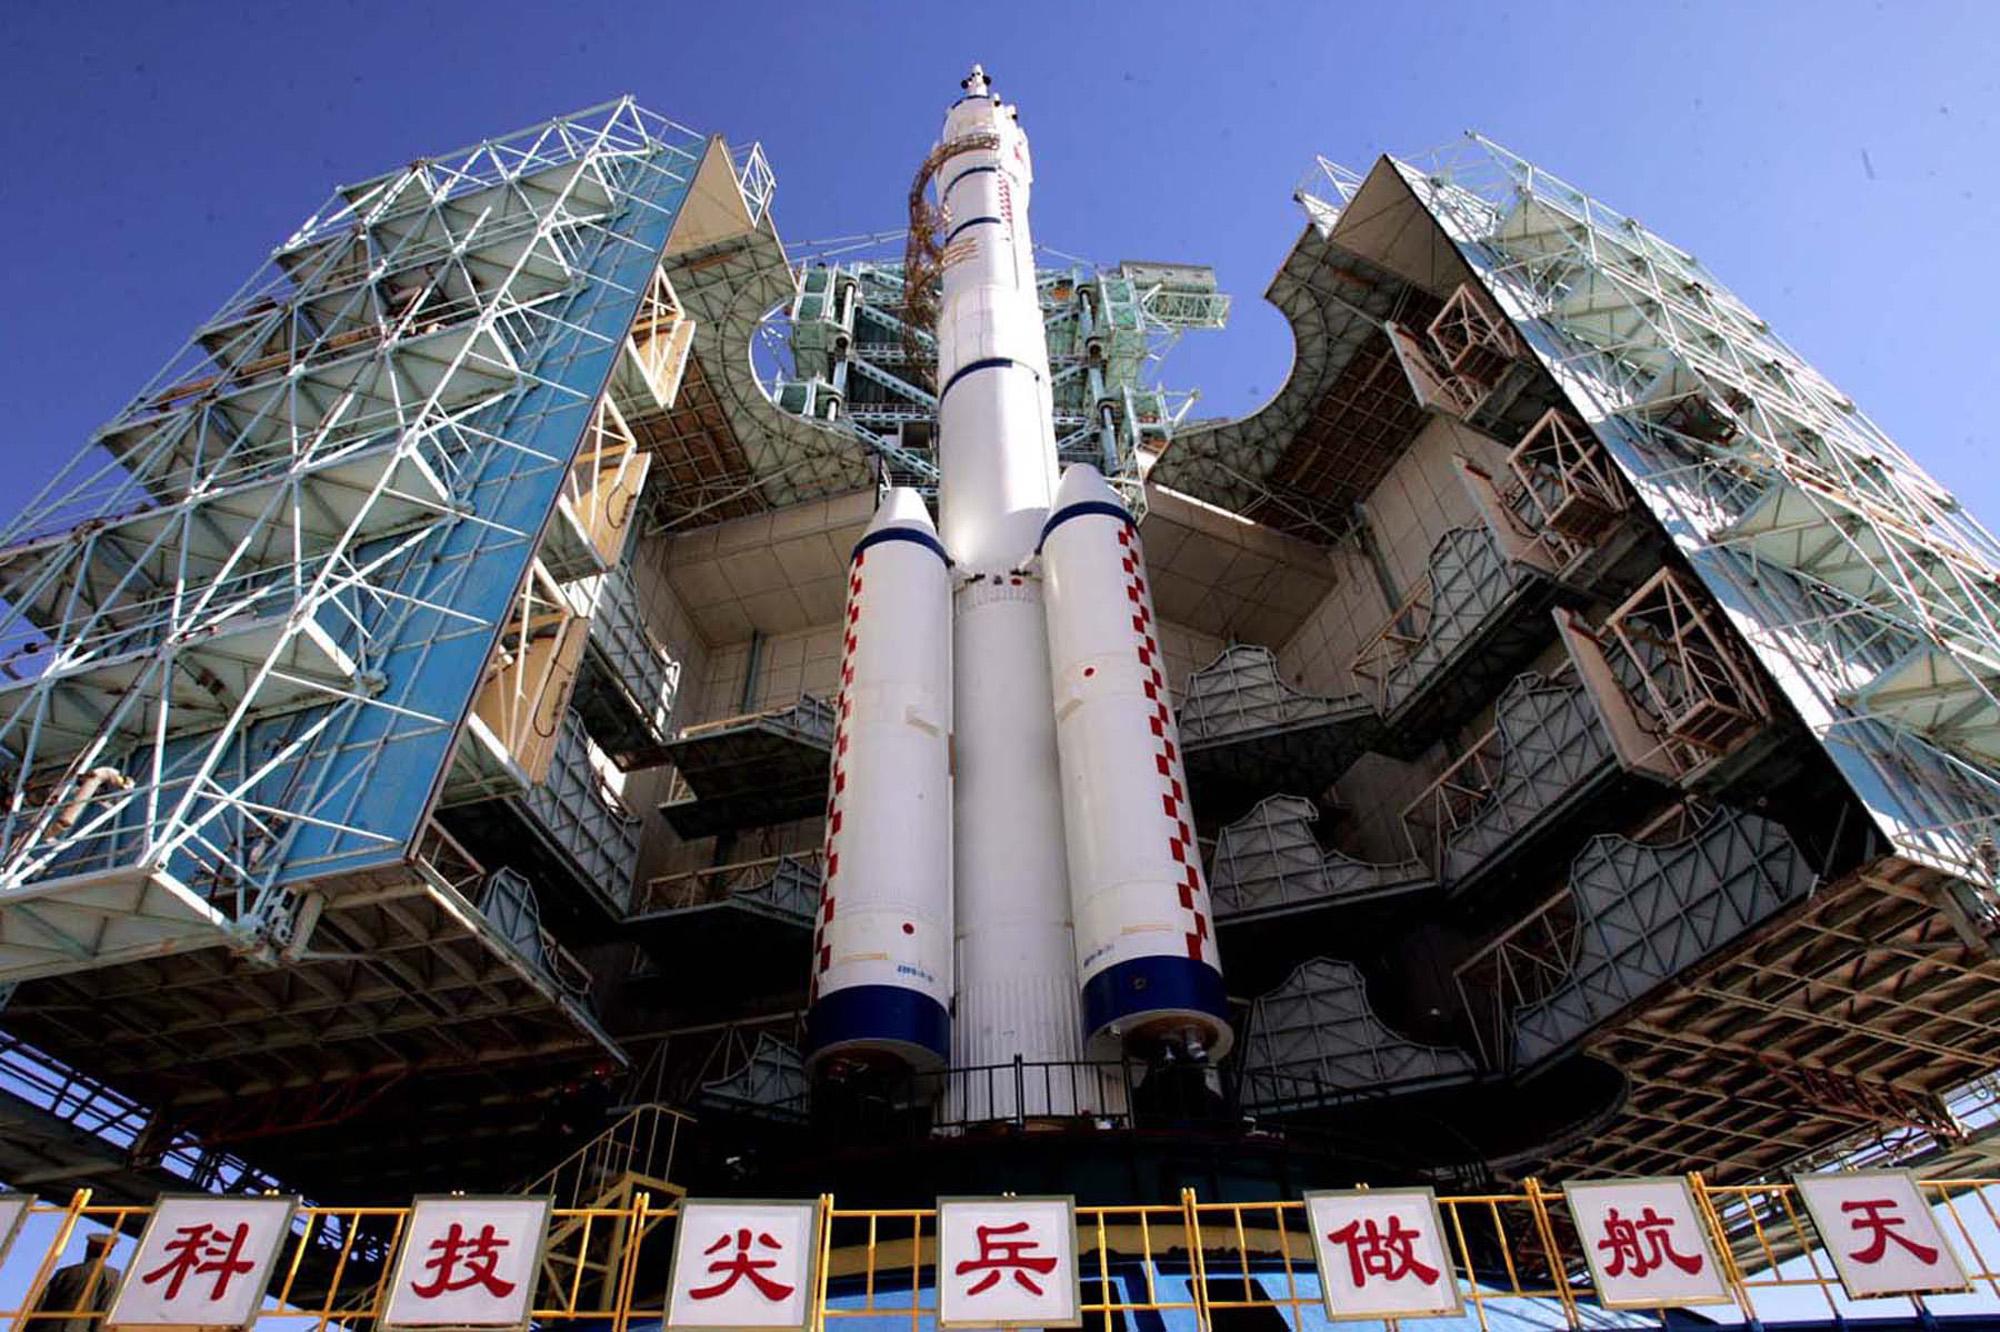 5 Rocket Large Model Shenzhou Long March Spacecraft CZ